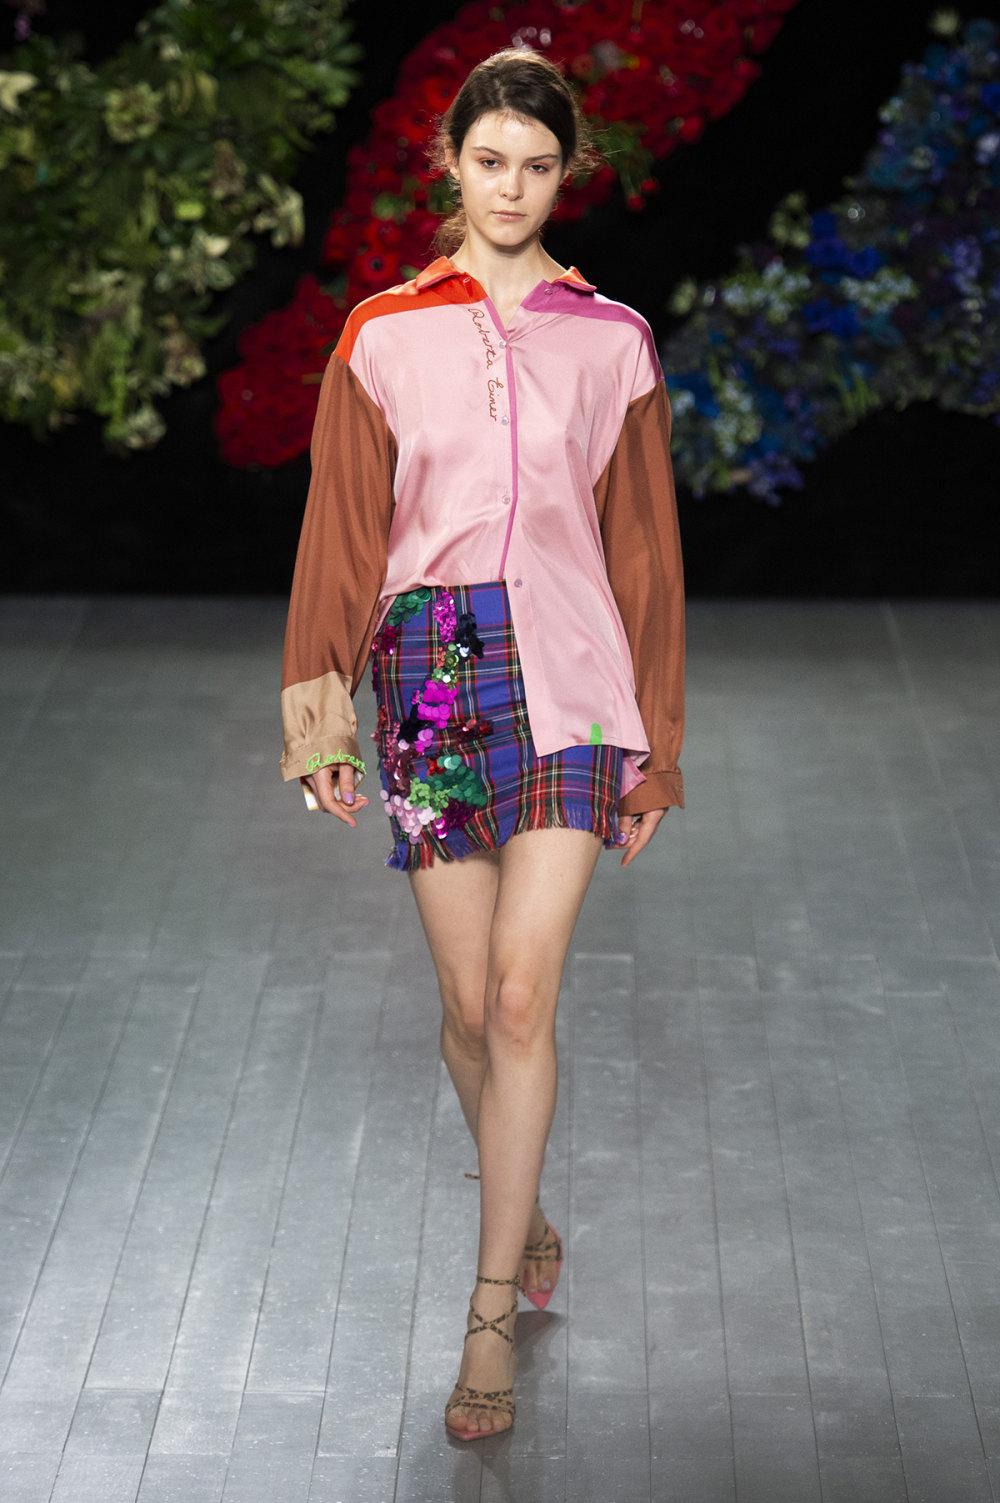 Roberta Einer时装系列格子呢西装外套收紧腰部霓虹色腰带连帽衫-13.jpg